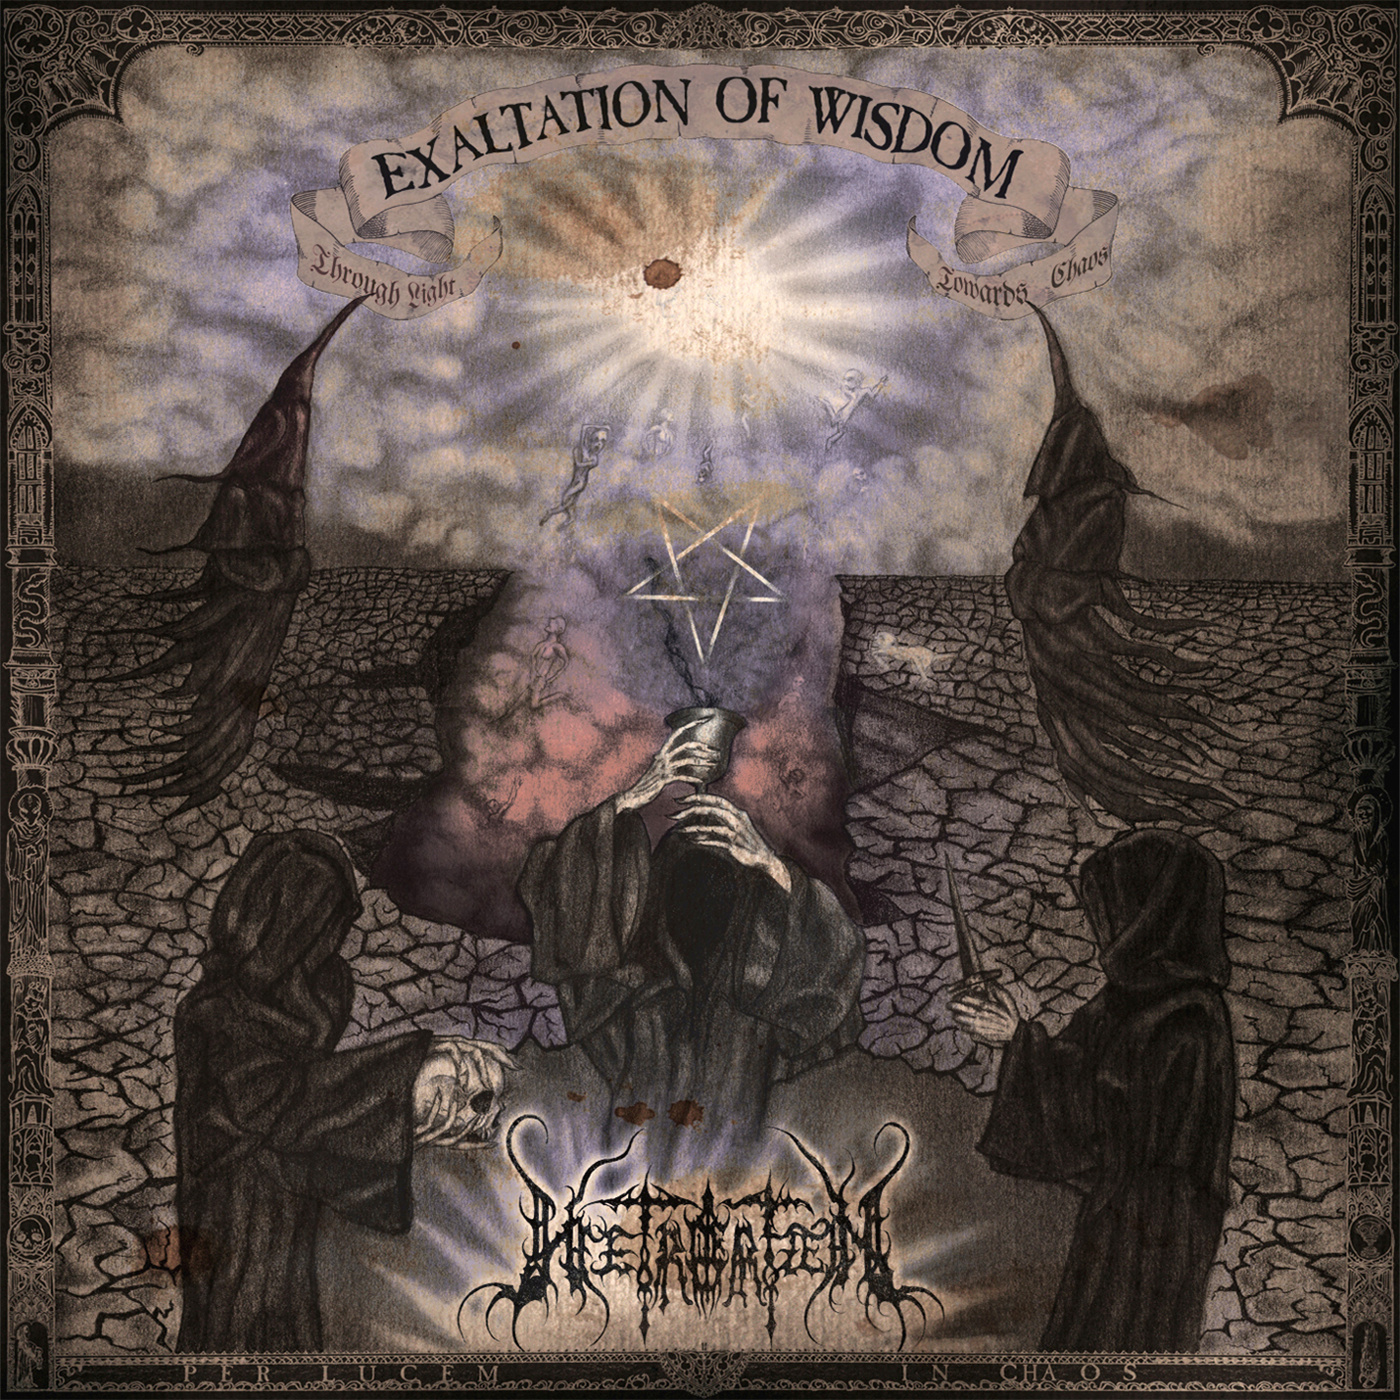 Exaltation of Wisdom